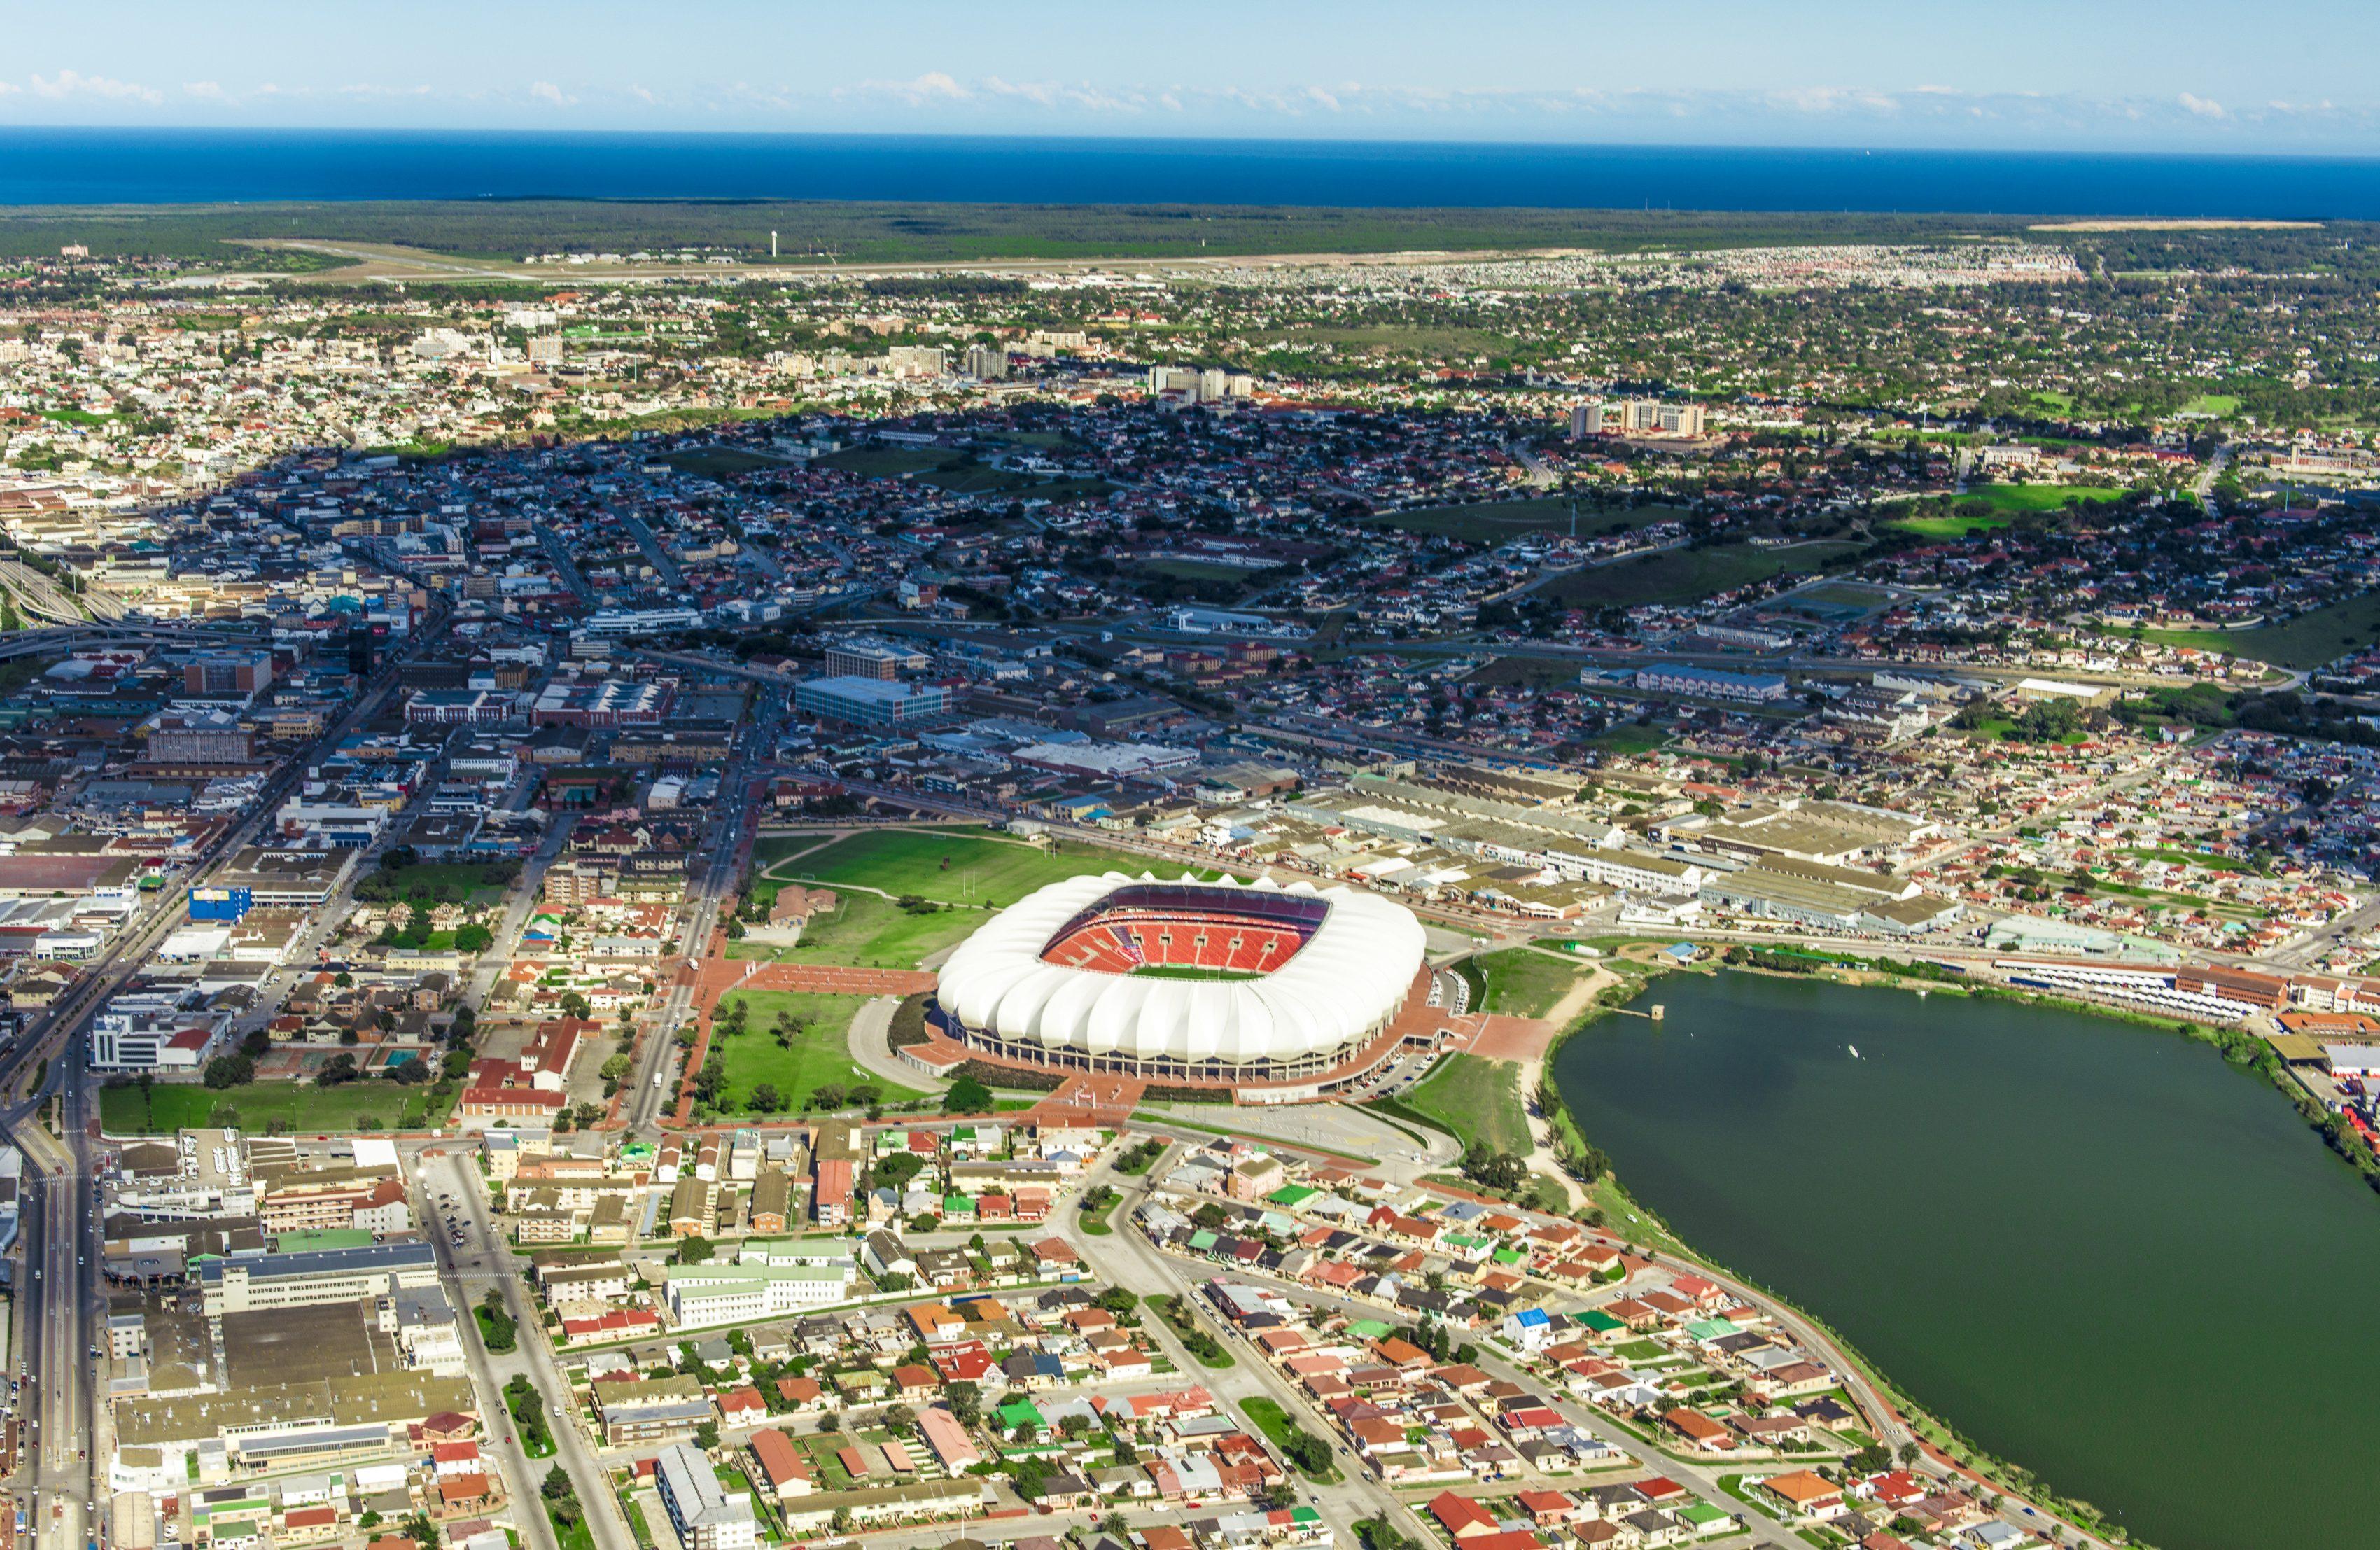 NNelson Mandela Bay Stadium